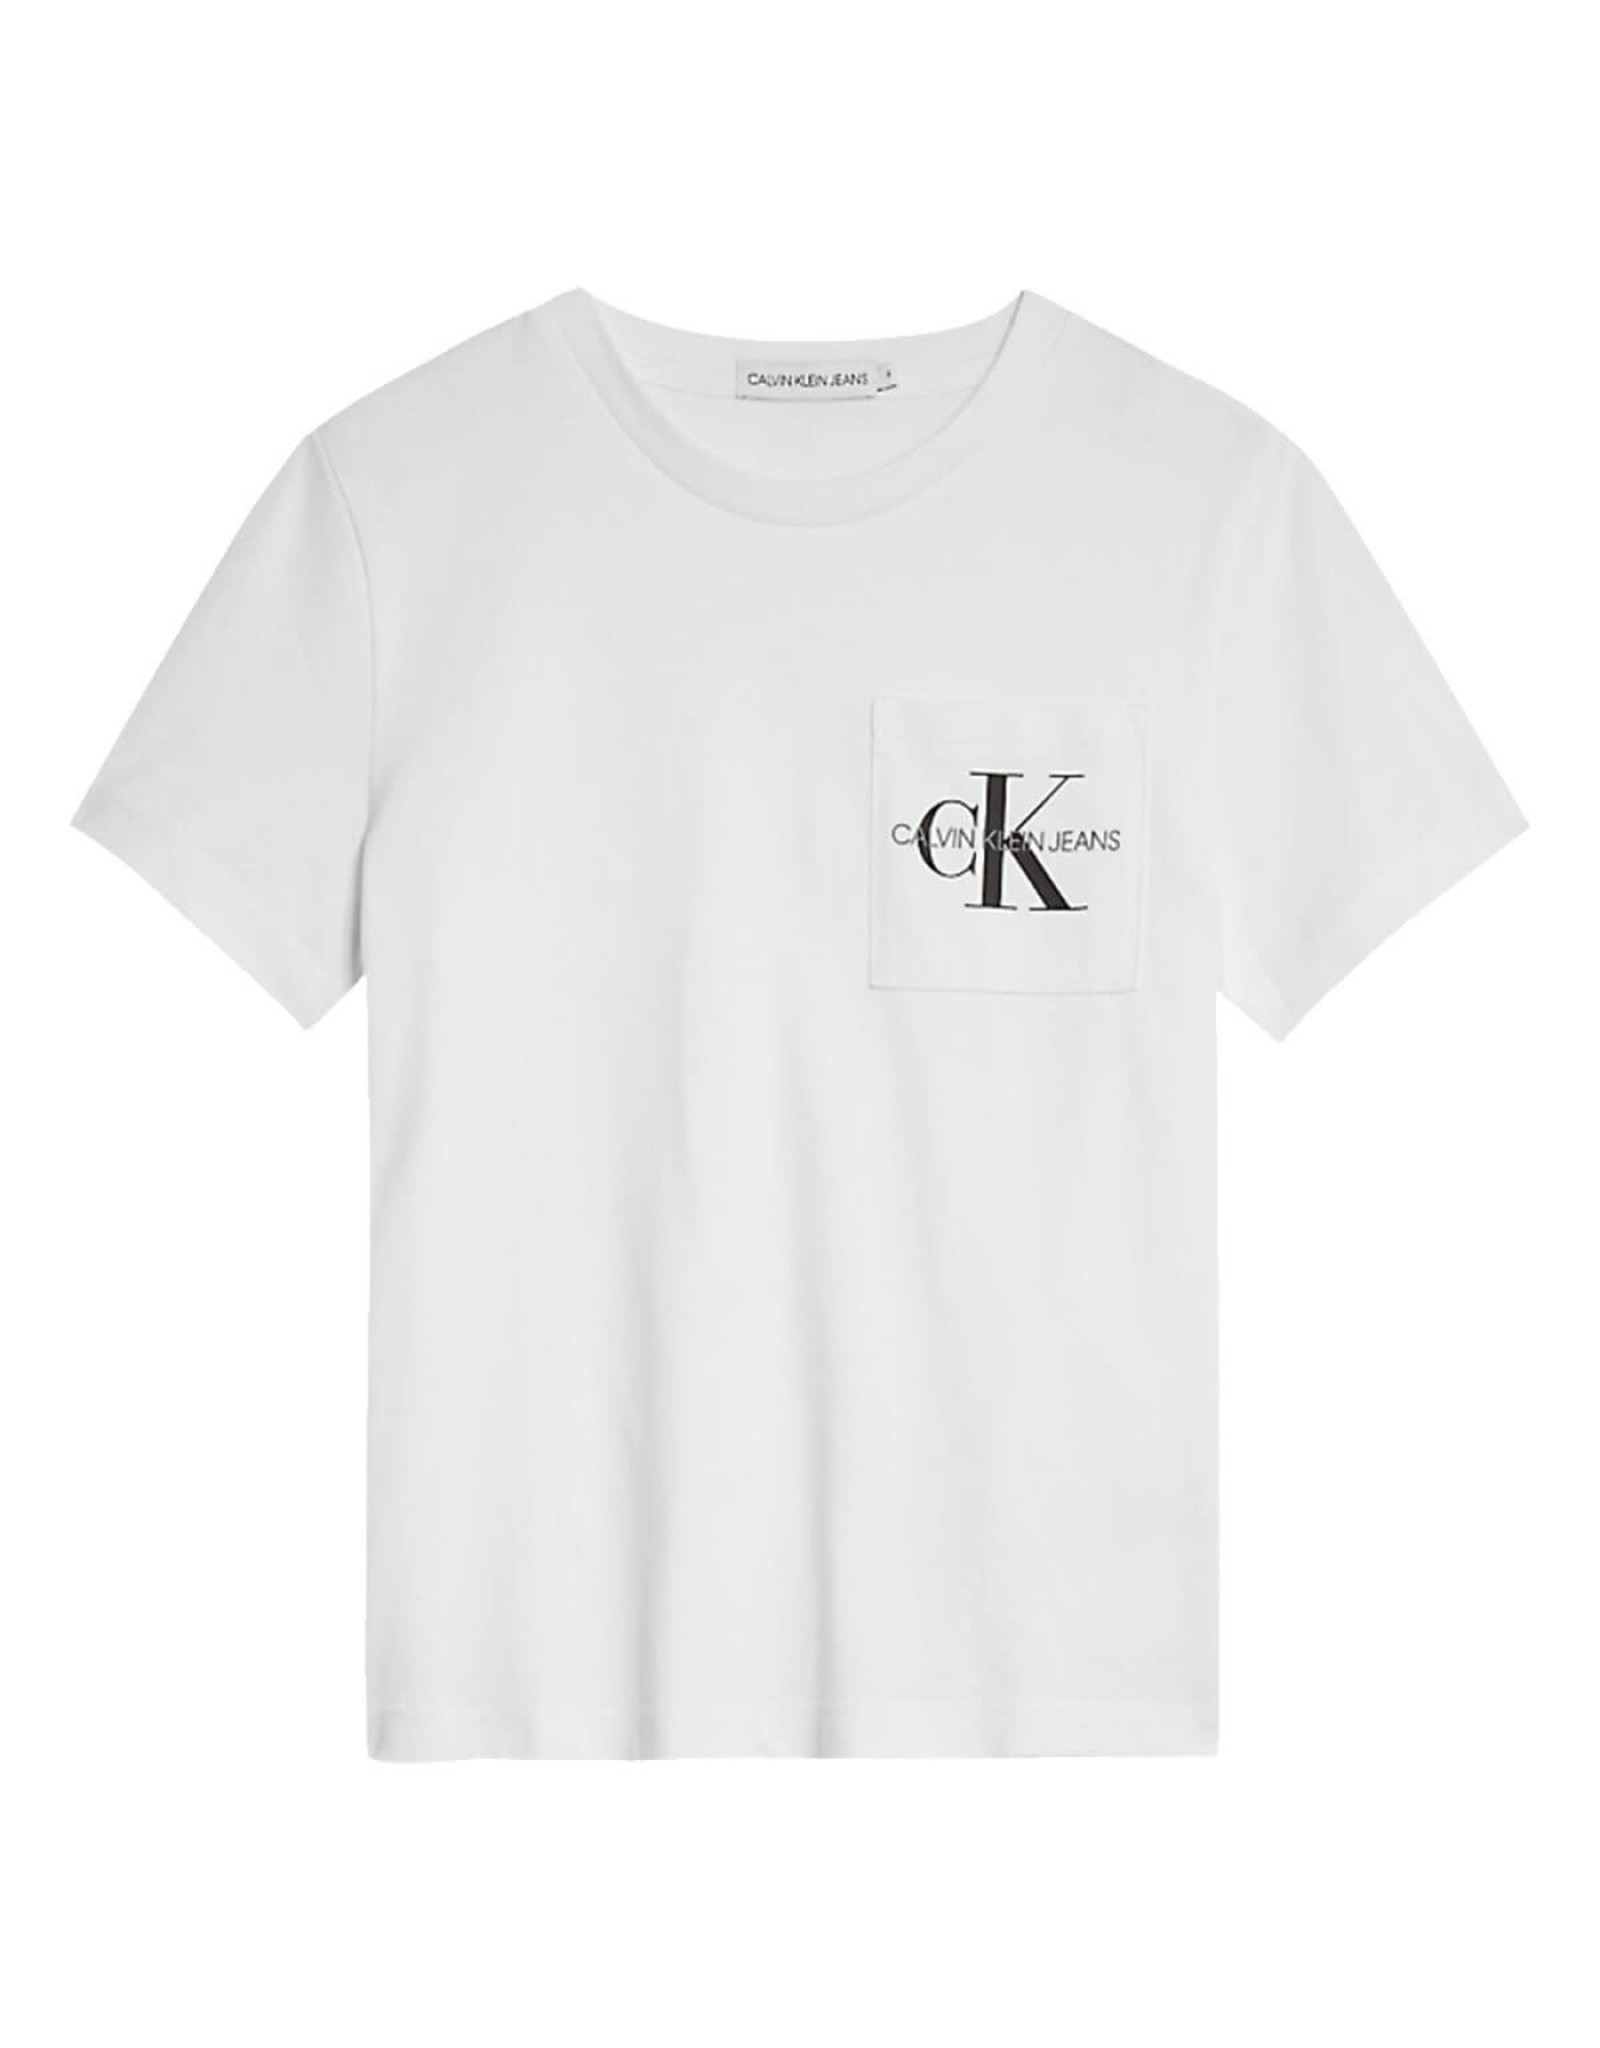 Calvin Klein 00457 T-Shirt maat 152